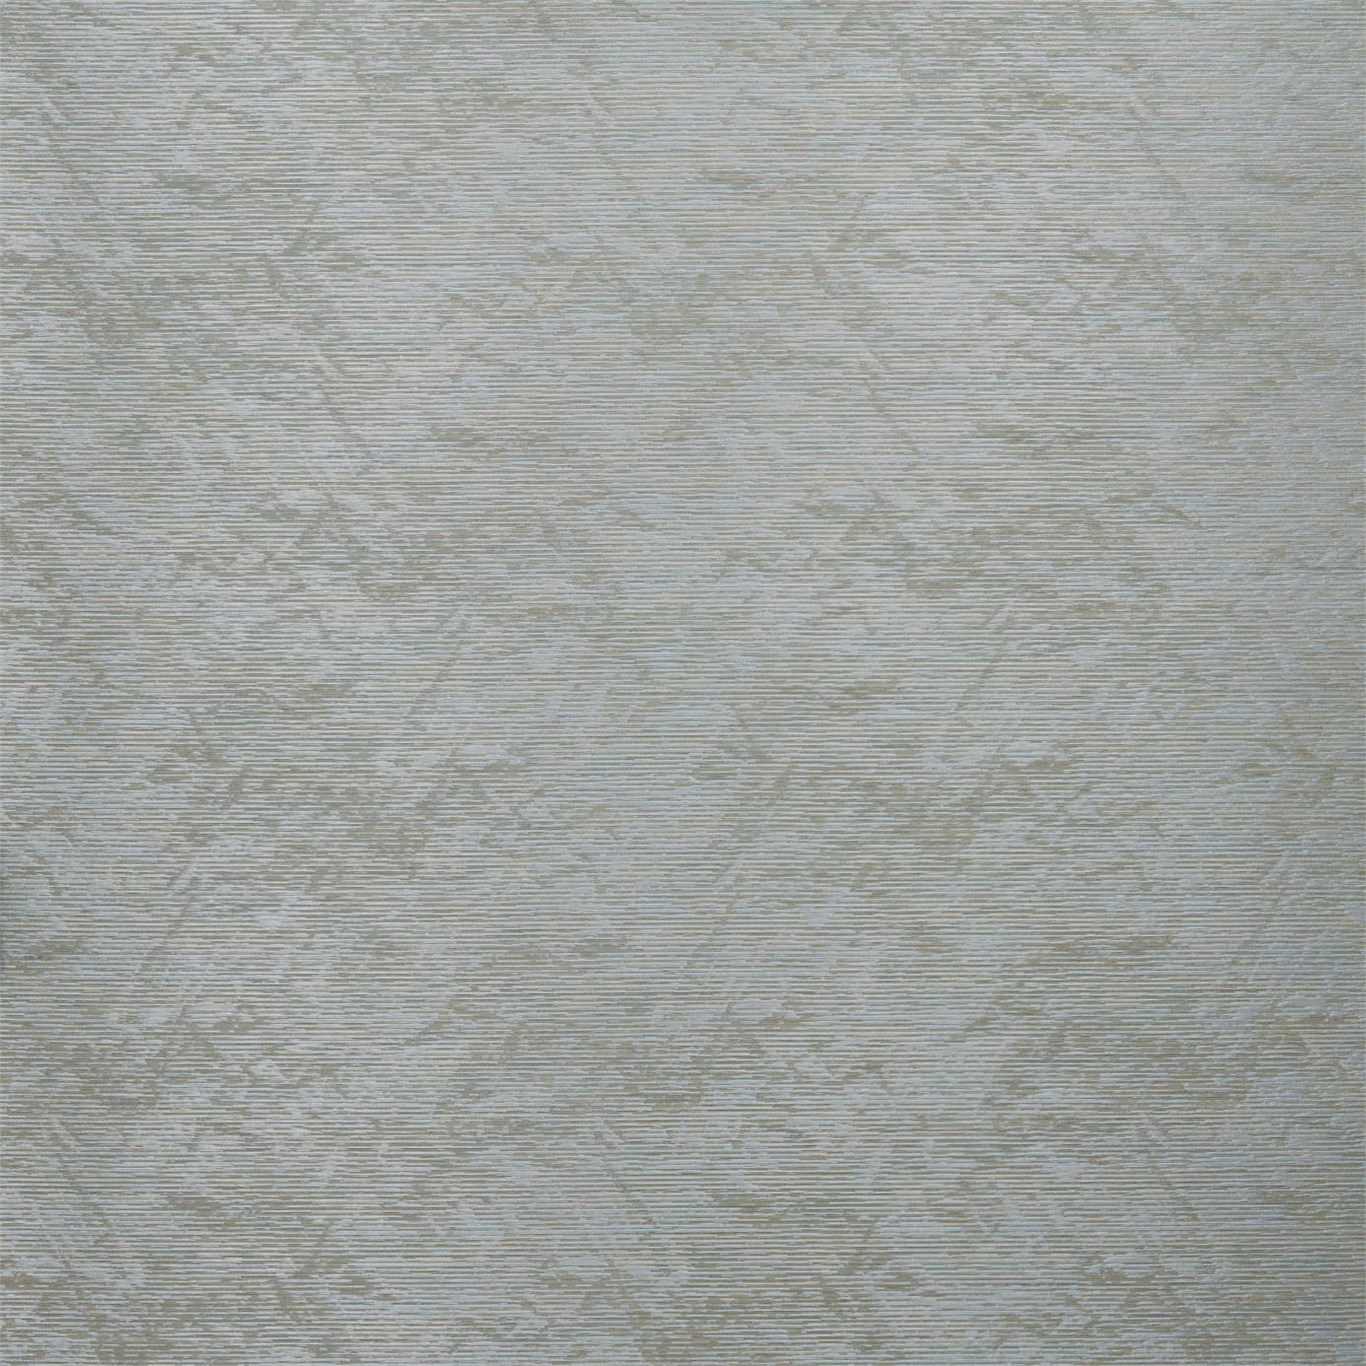 Английские обои Zoffany,  коллекция Akaishi, артикул312499